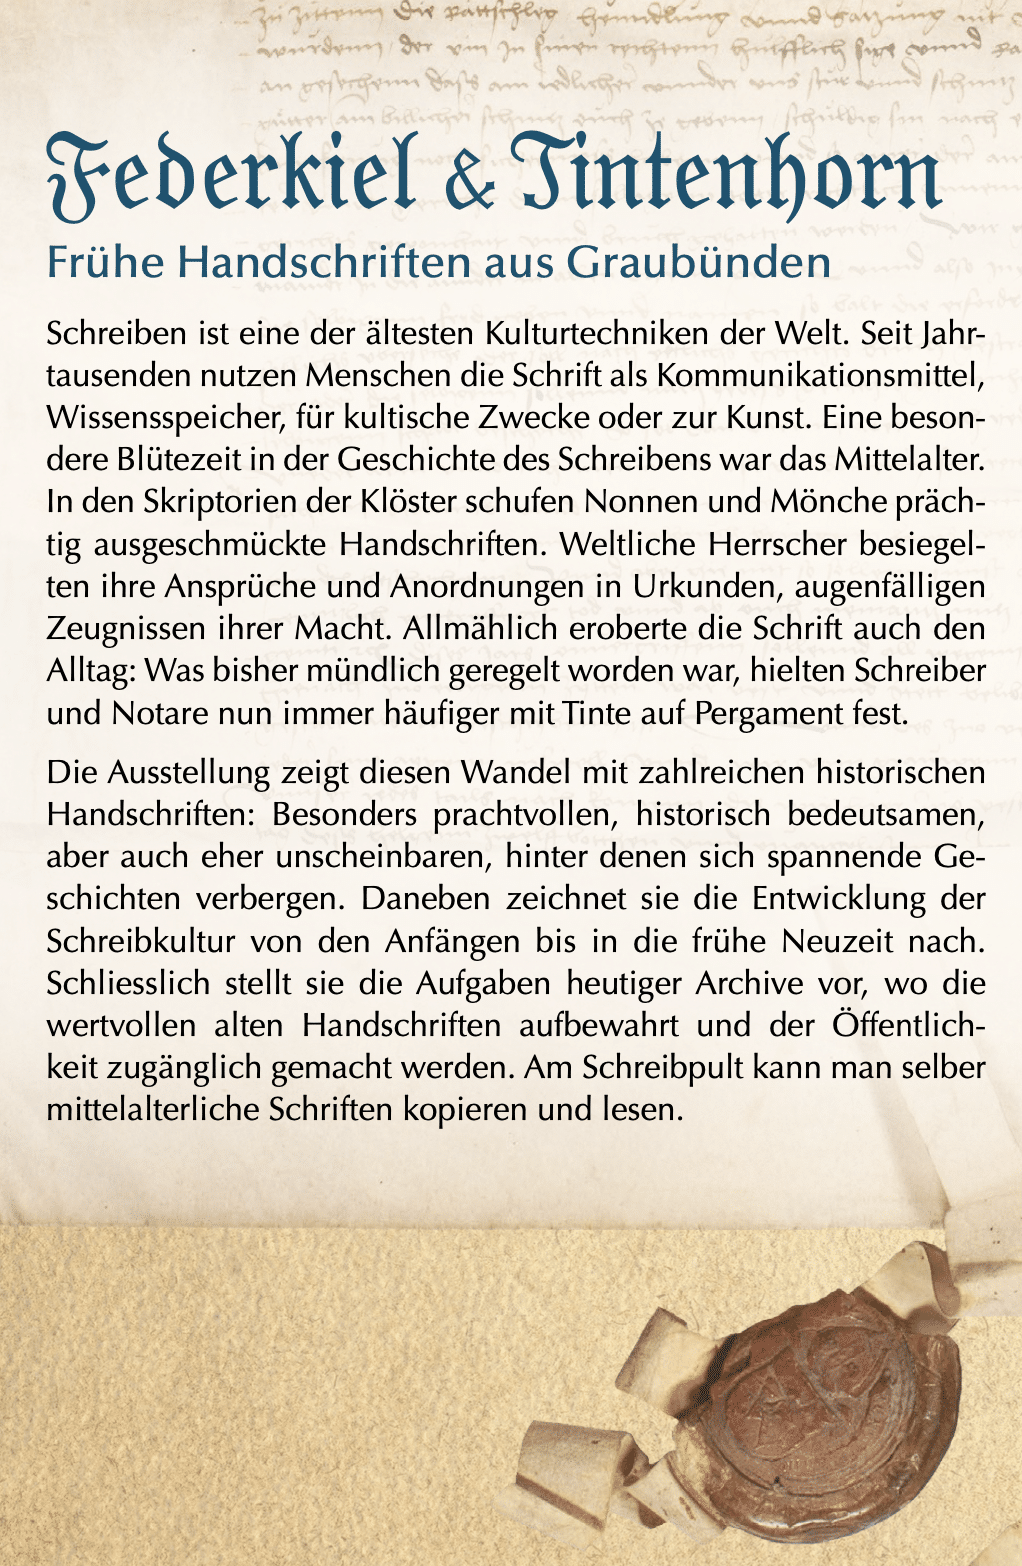 Federkiel & Tintenhorn